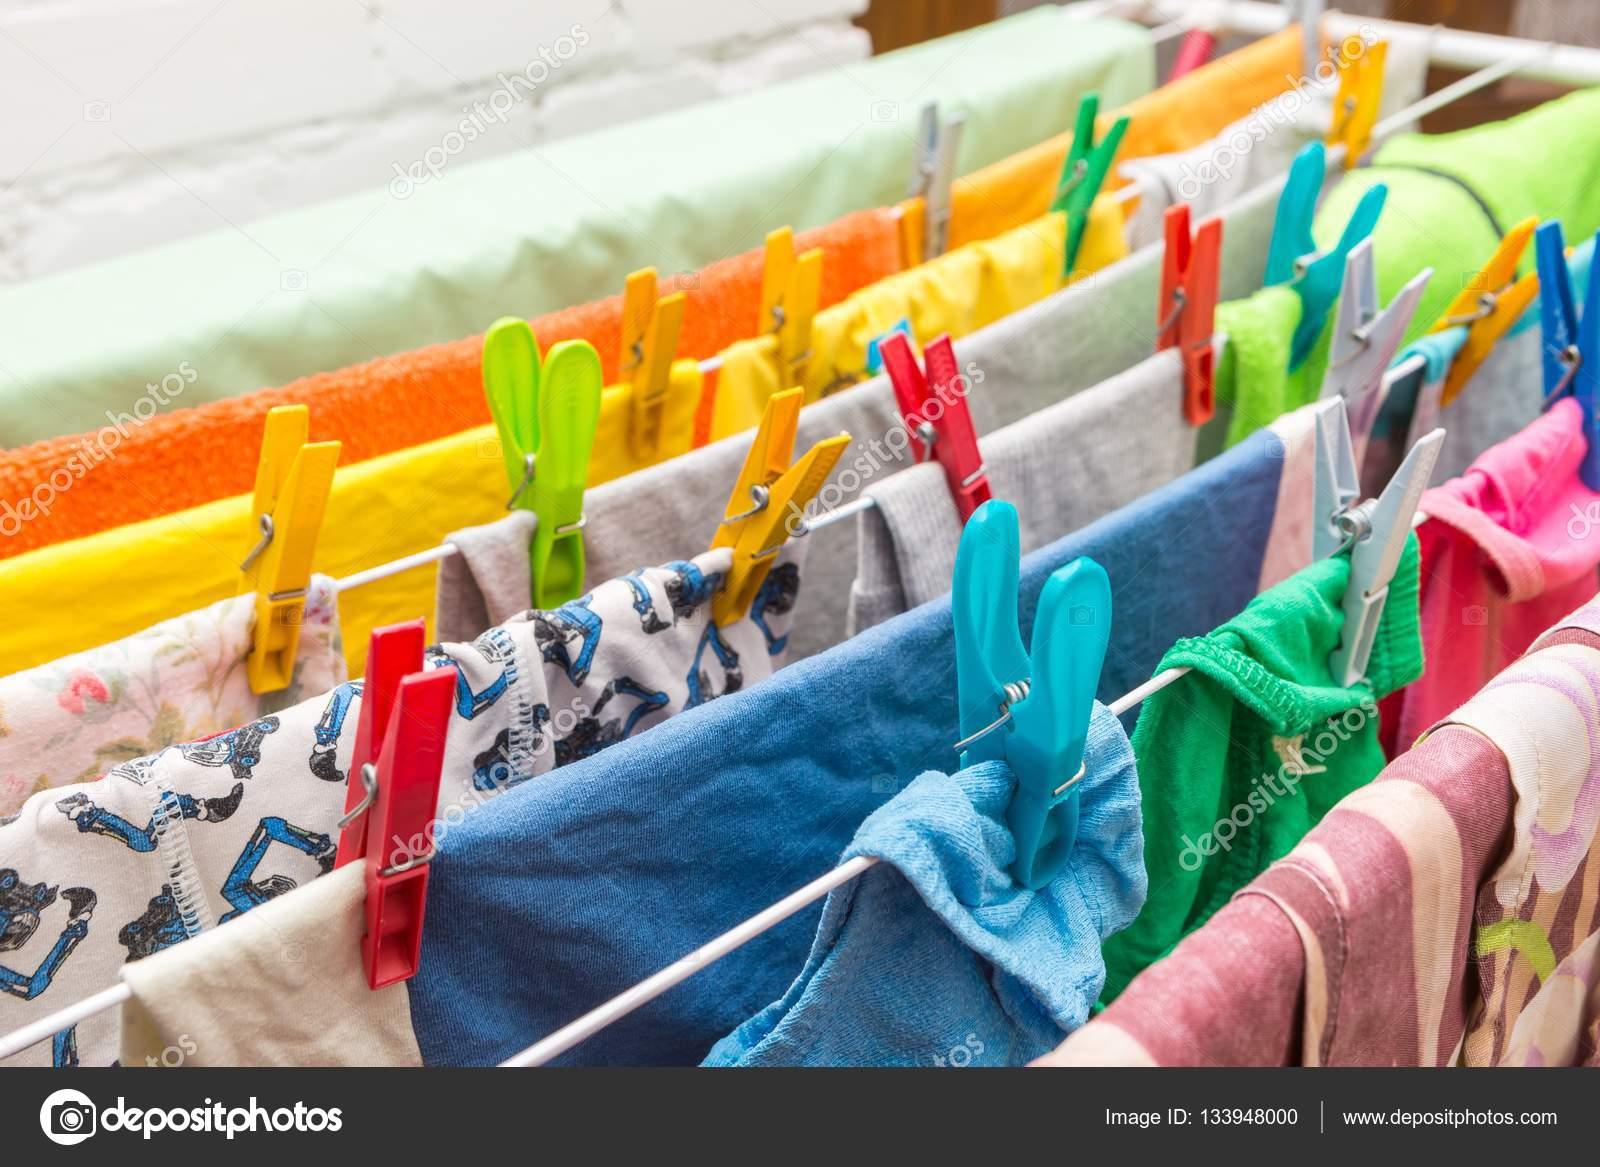 Kleidung trockner und kunststoff clips hautnah u2014 stockfoto © milosz